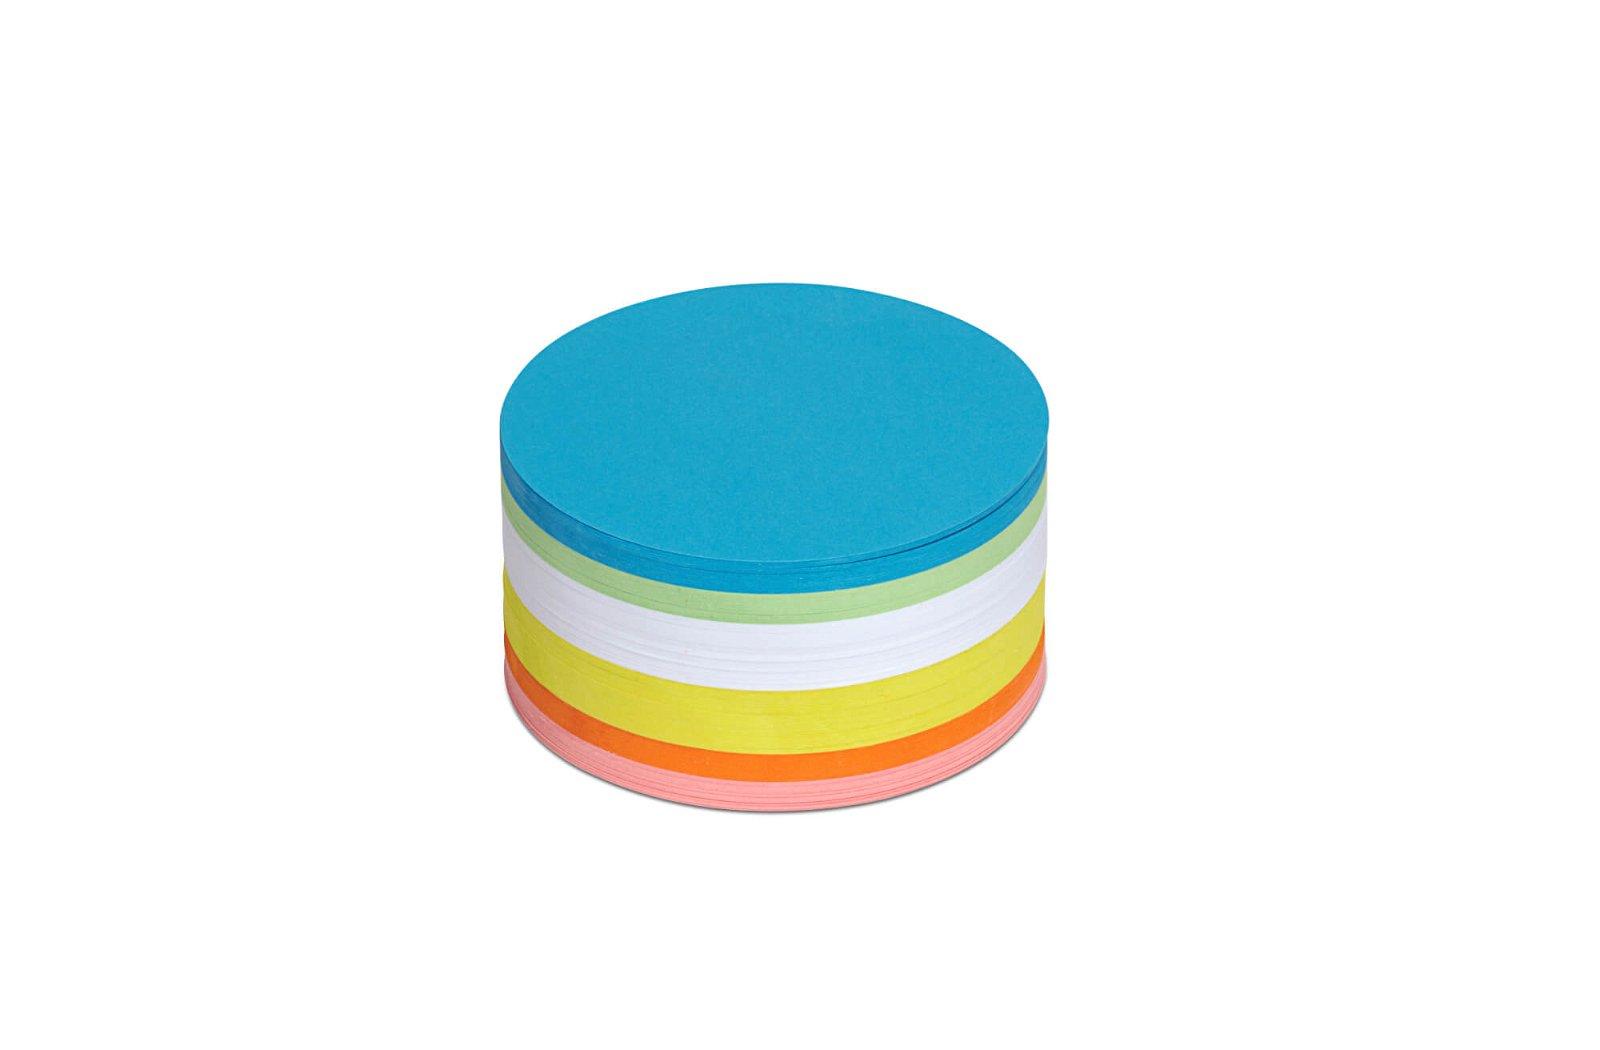 Moderationskarten rund, Ø 9,5 cm, 250 St./Pack, farbig sortiert